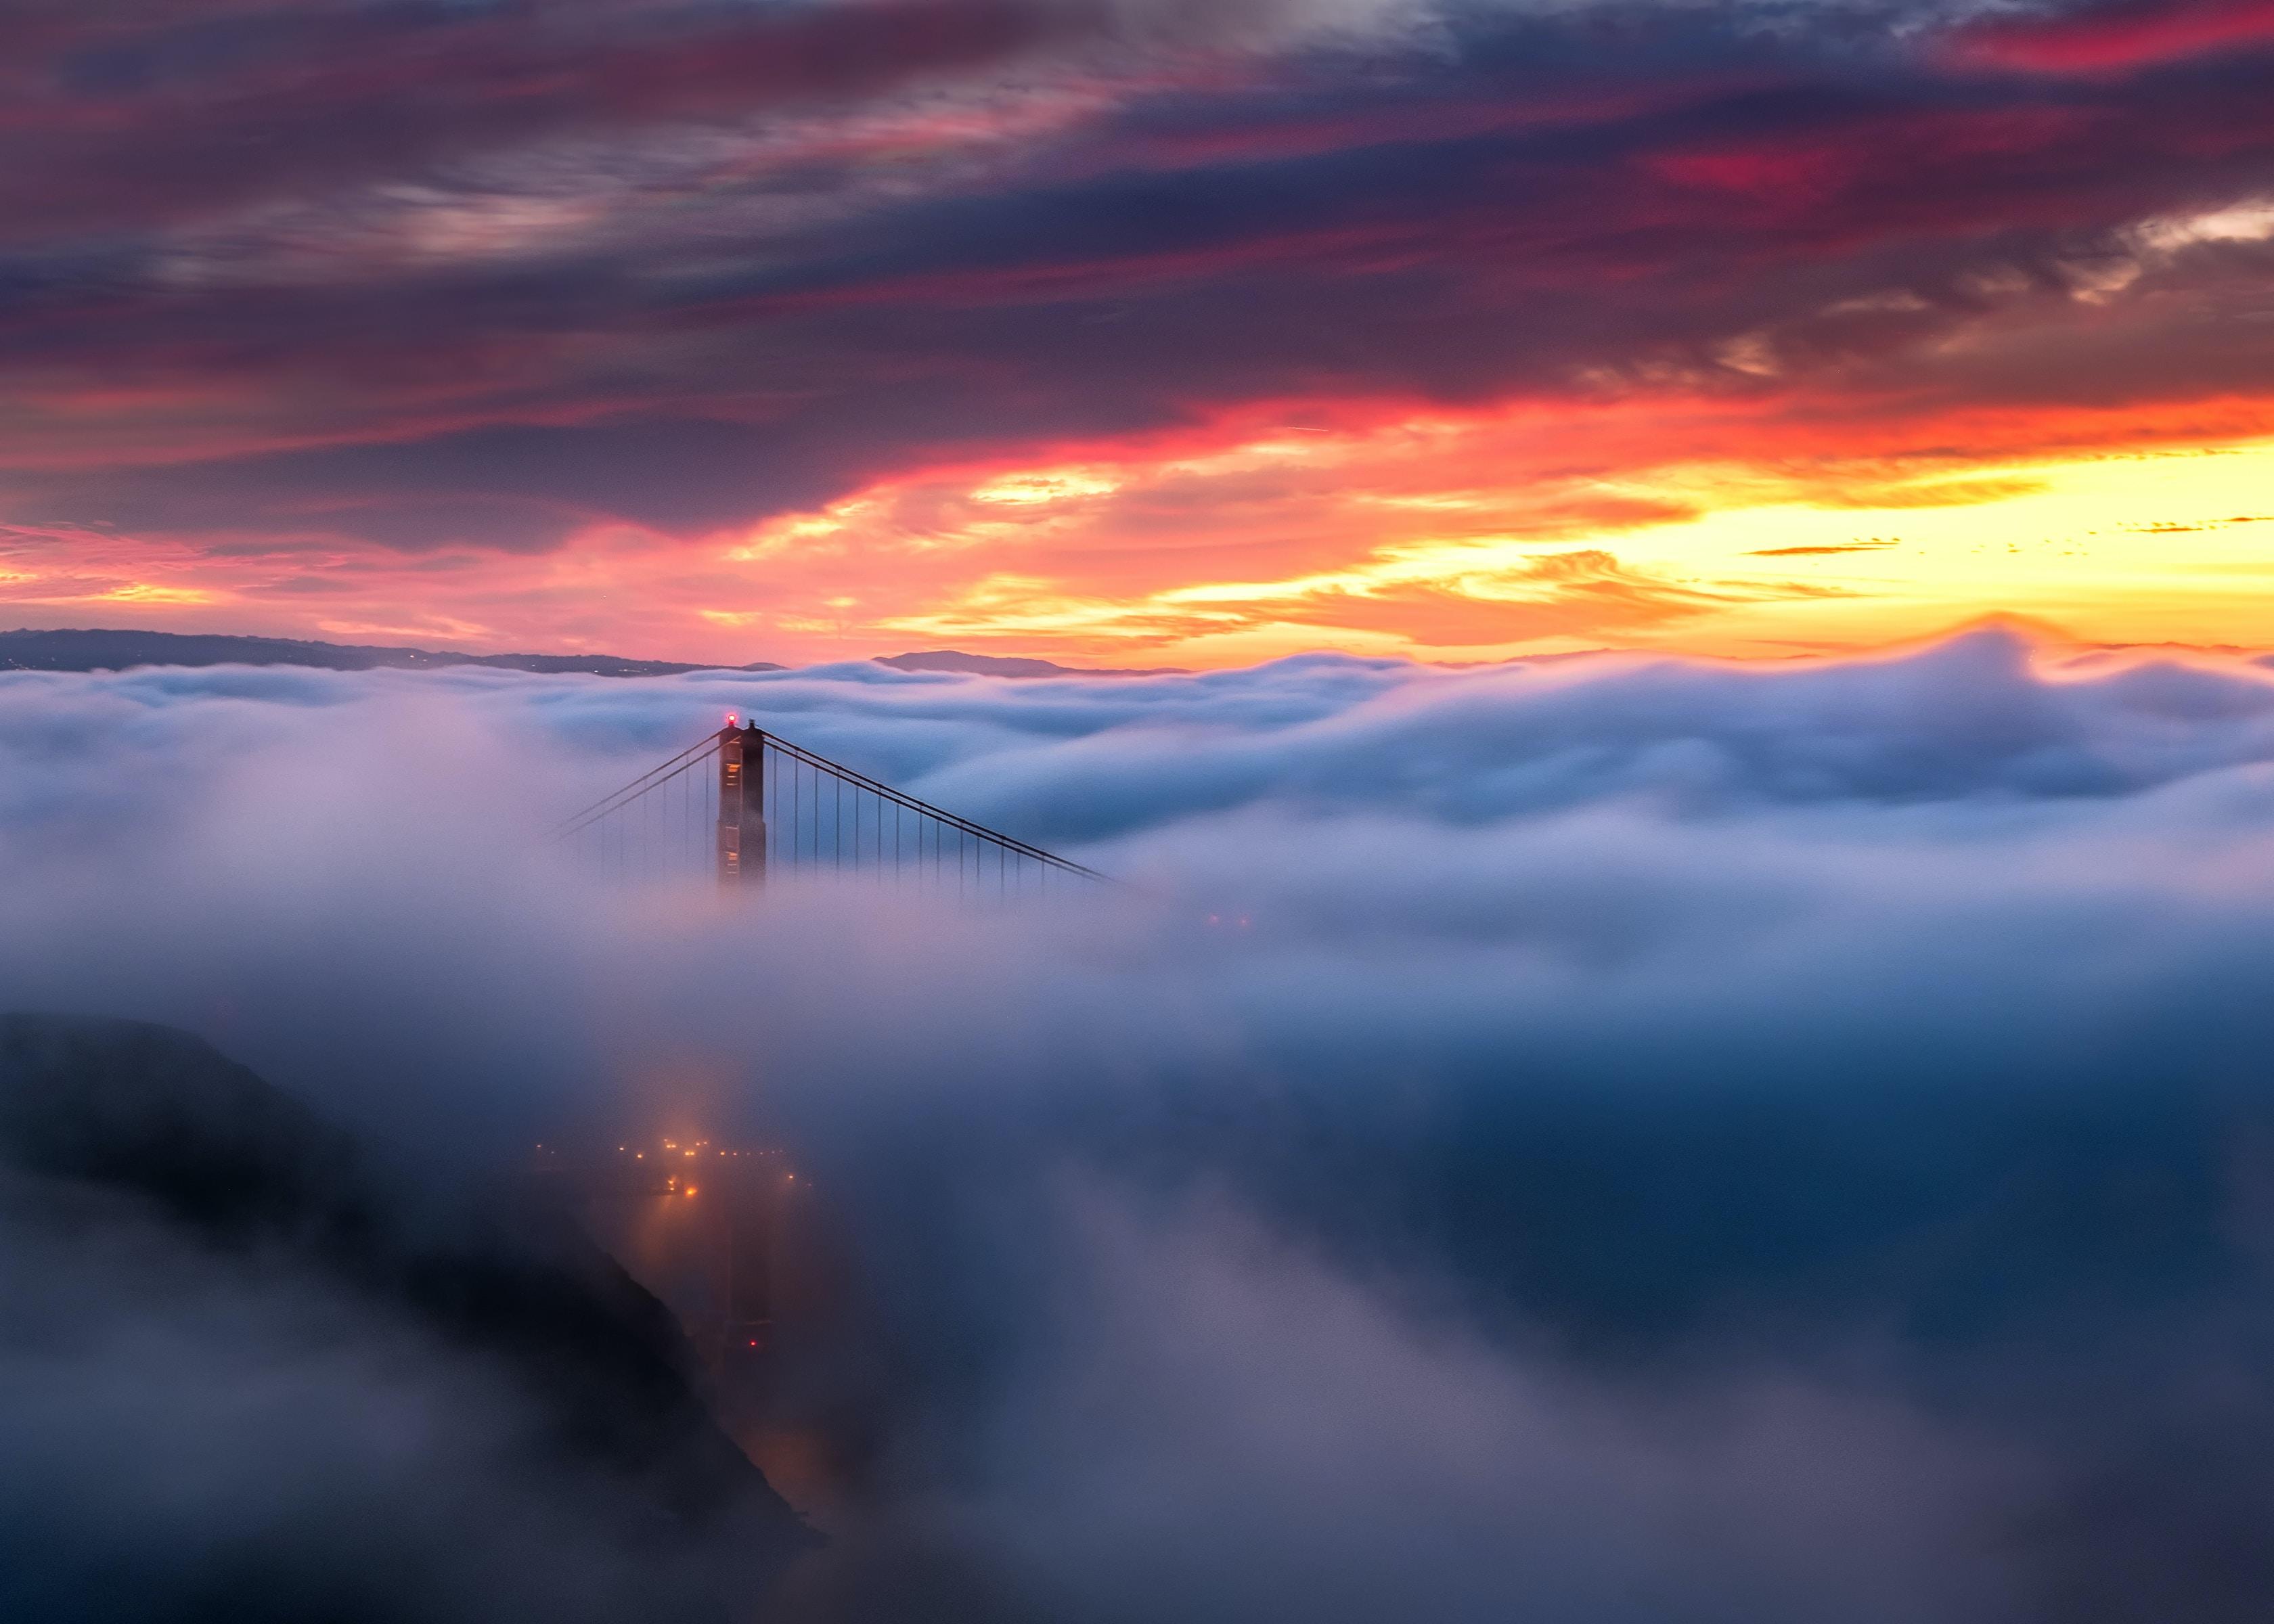 Golden Gate Bridge during golden hour